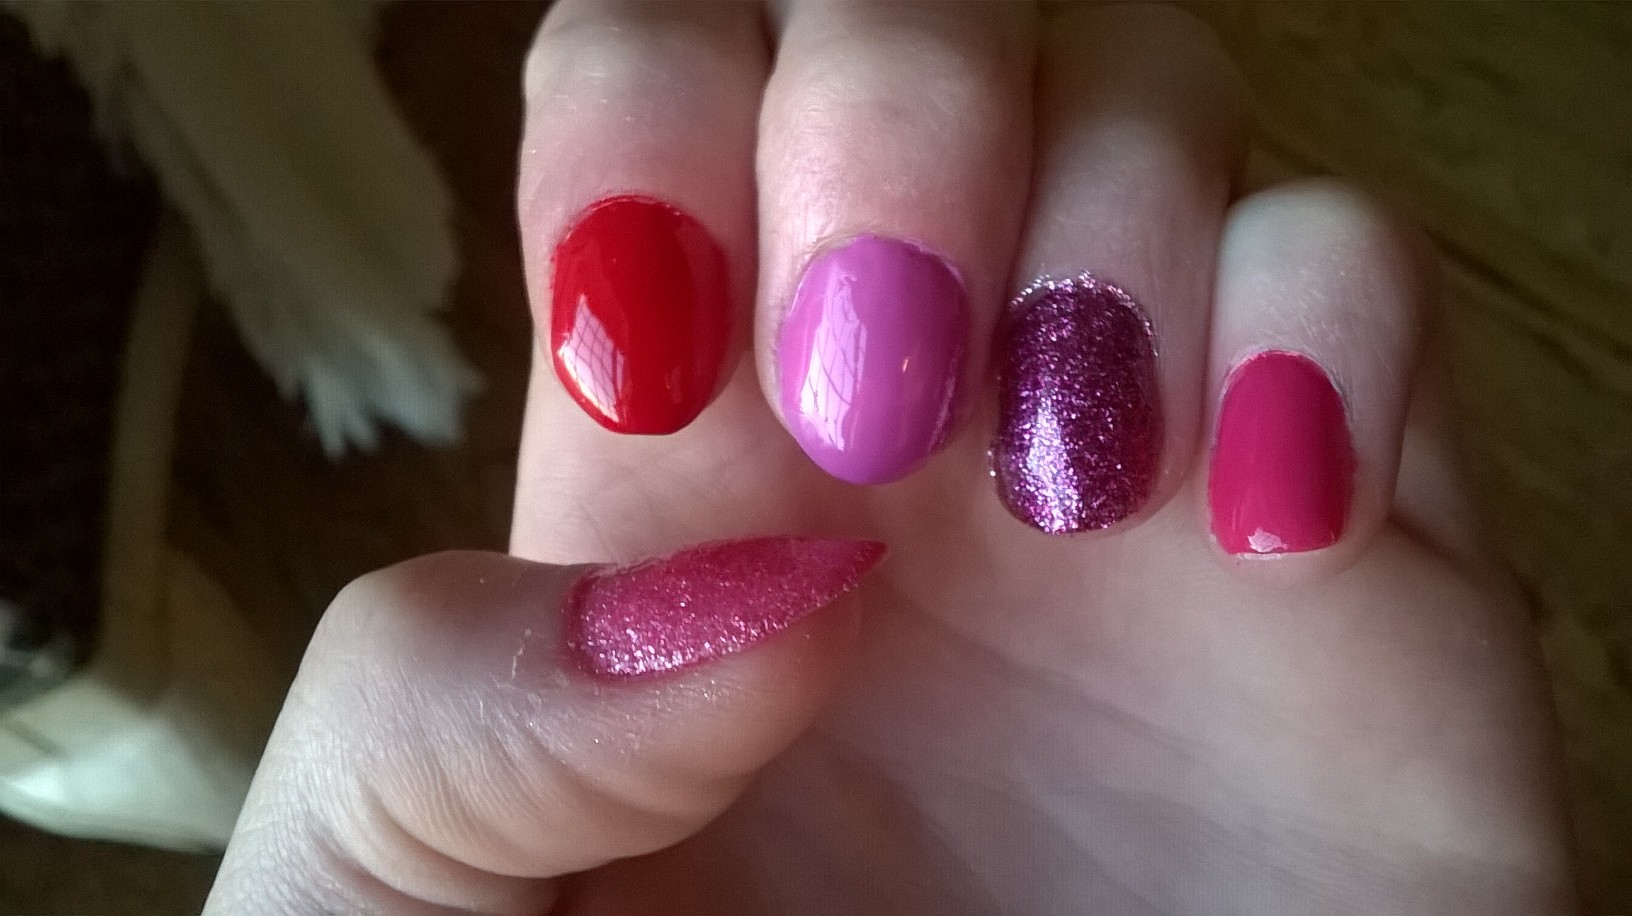 Light Pink Glitter Nail Polish i Have a Light Pink Polish on